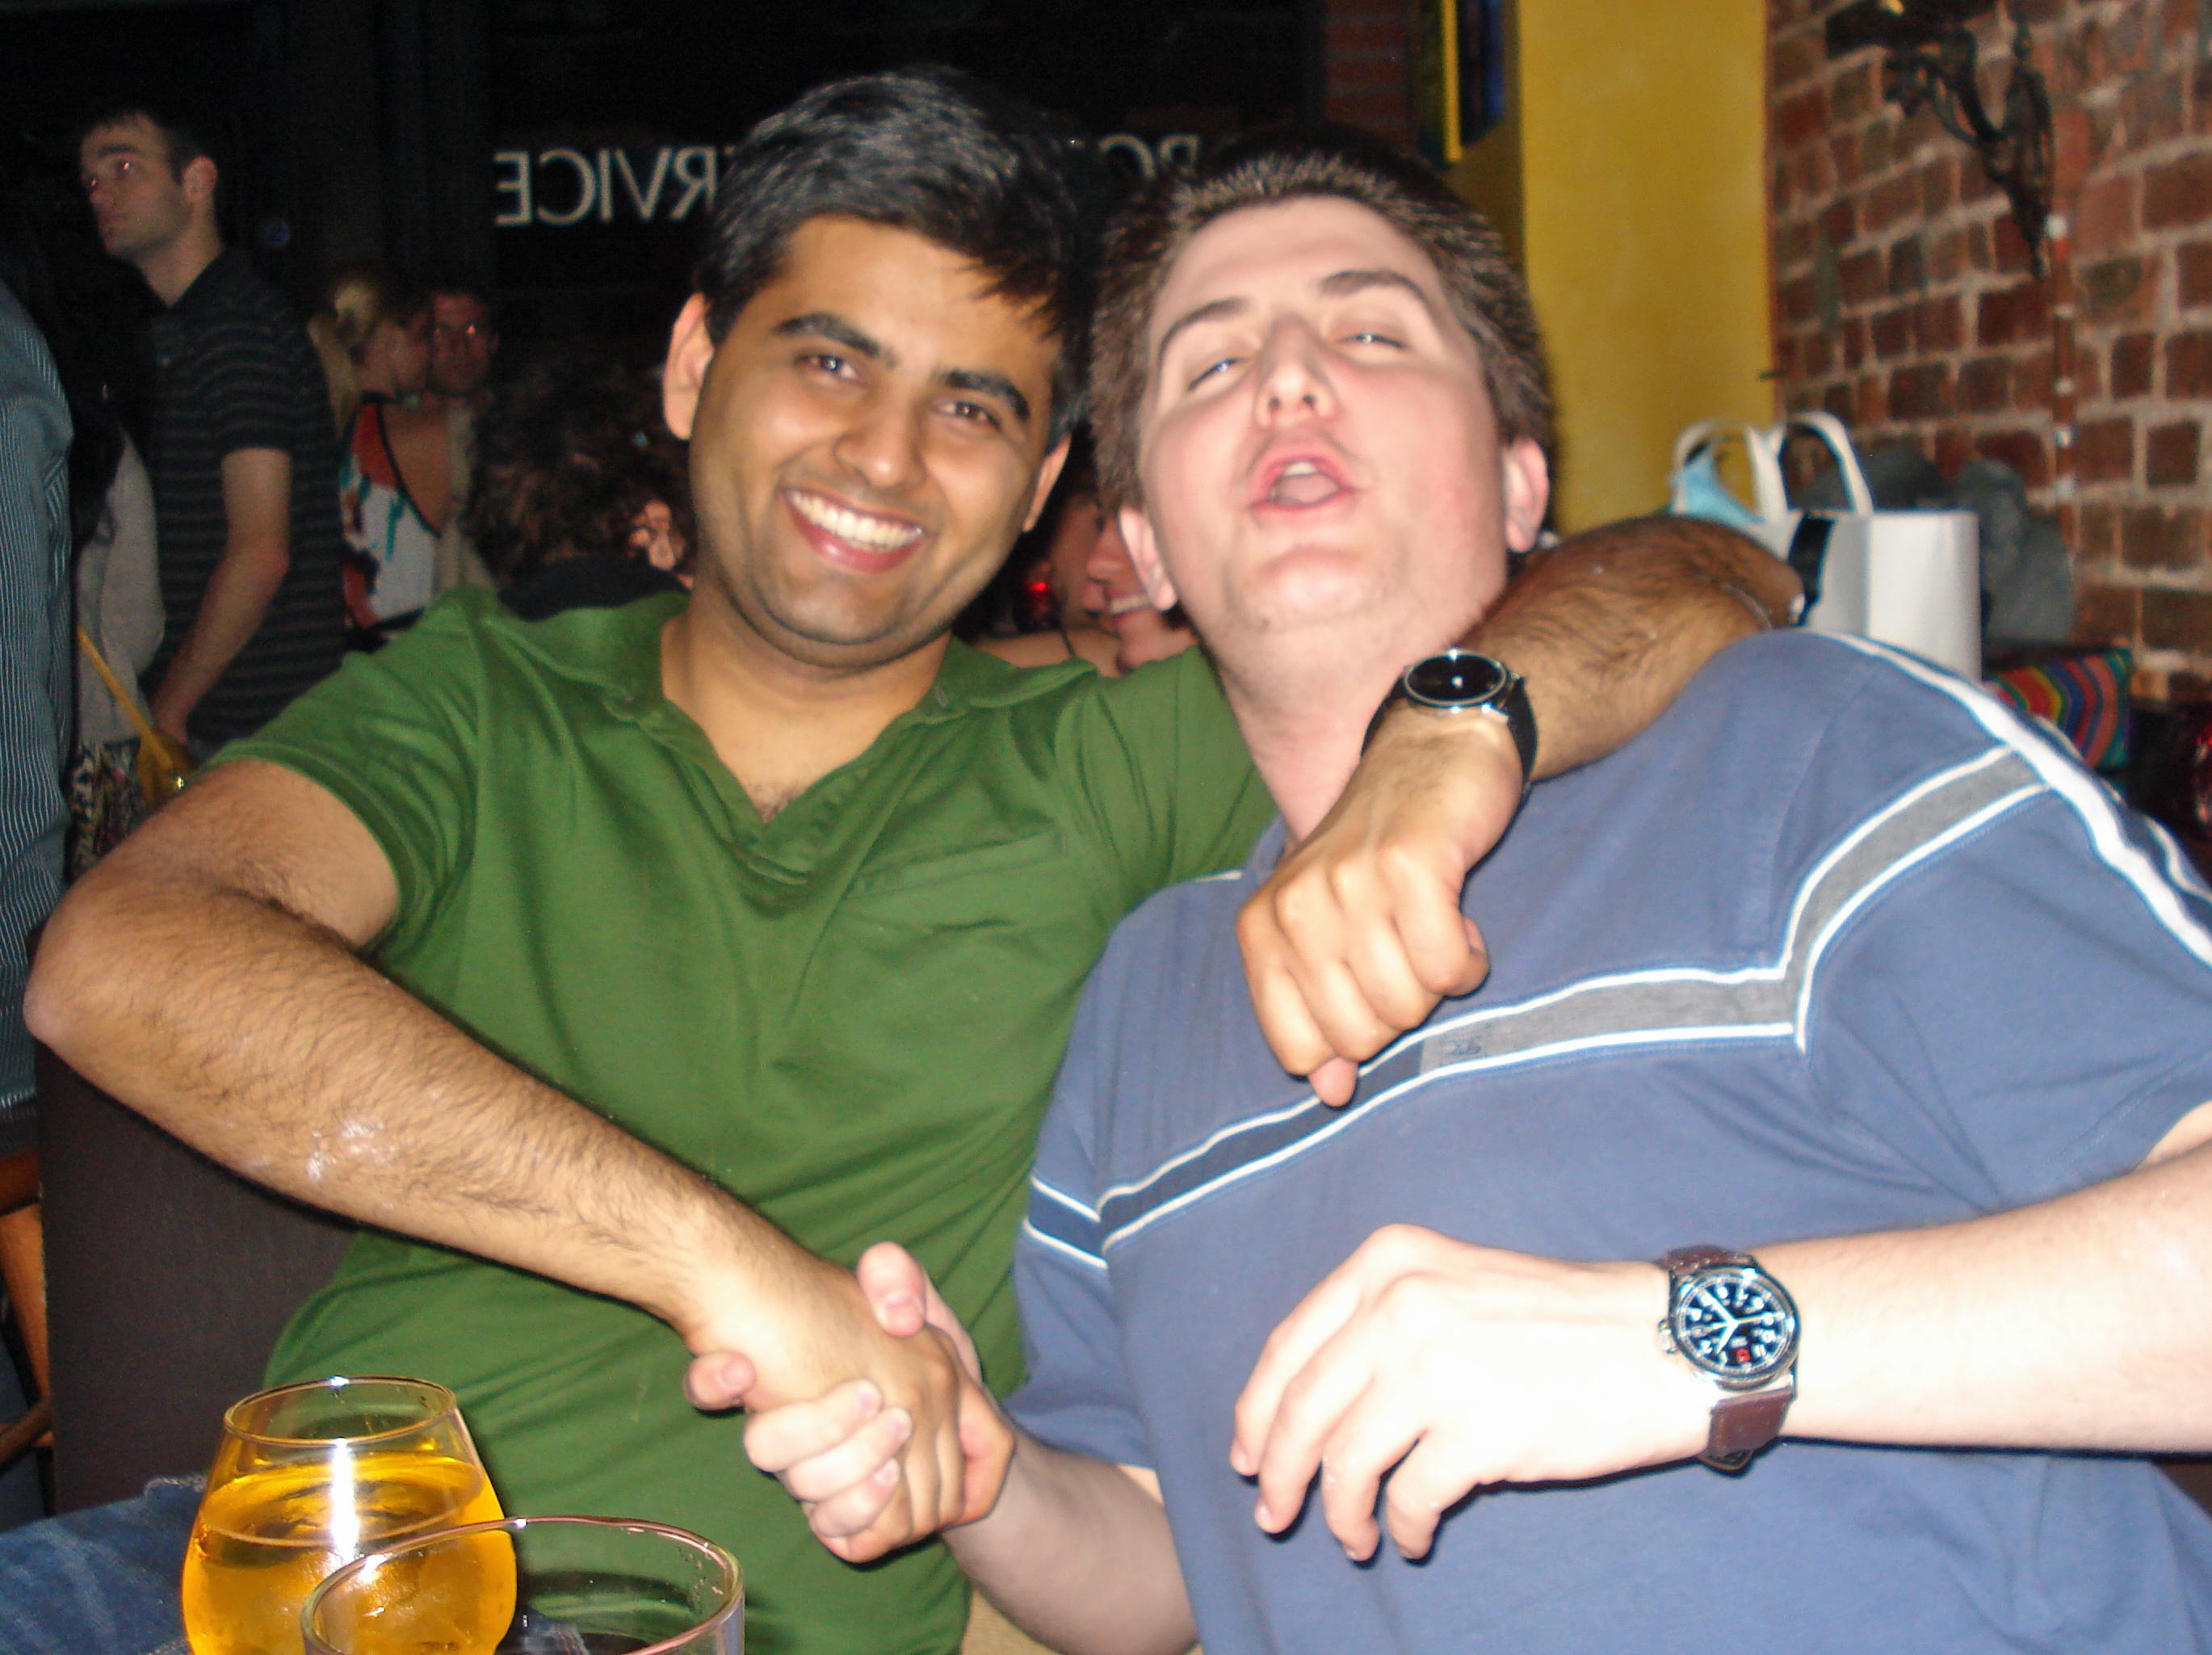 A Magic fan and a Lakers fan walk into a bar...